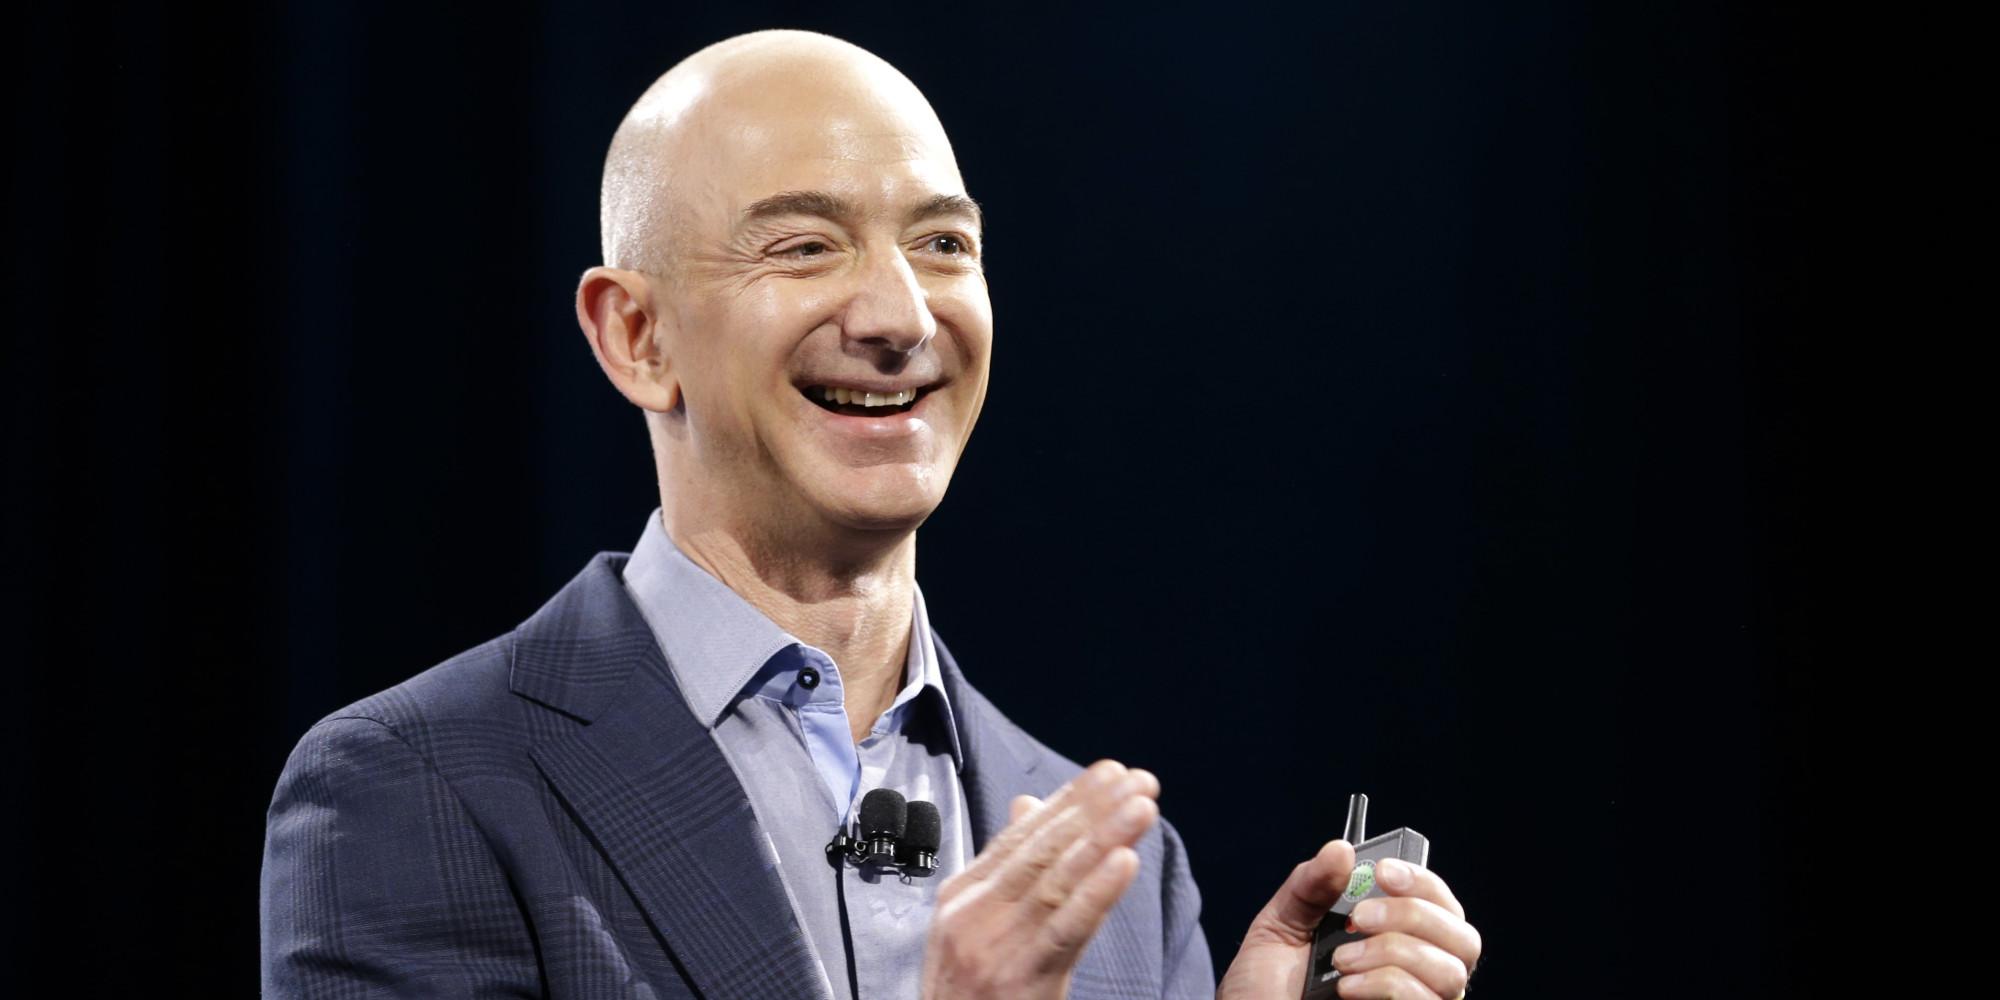 Jeff Bezos' Rocket Company Will Start Test Flights This Year ...